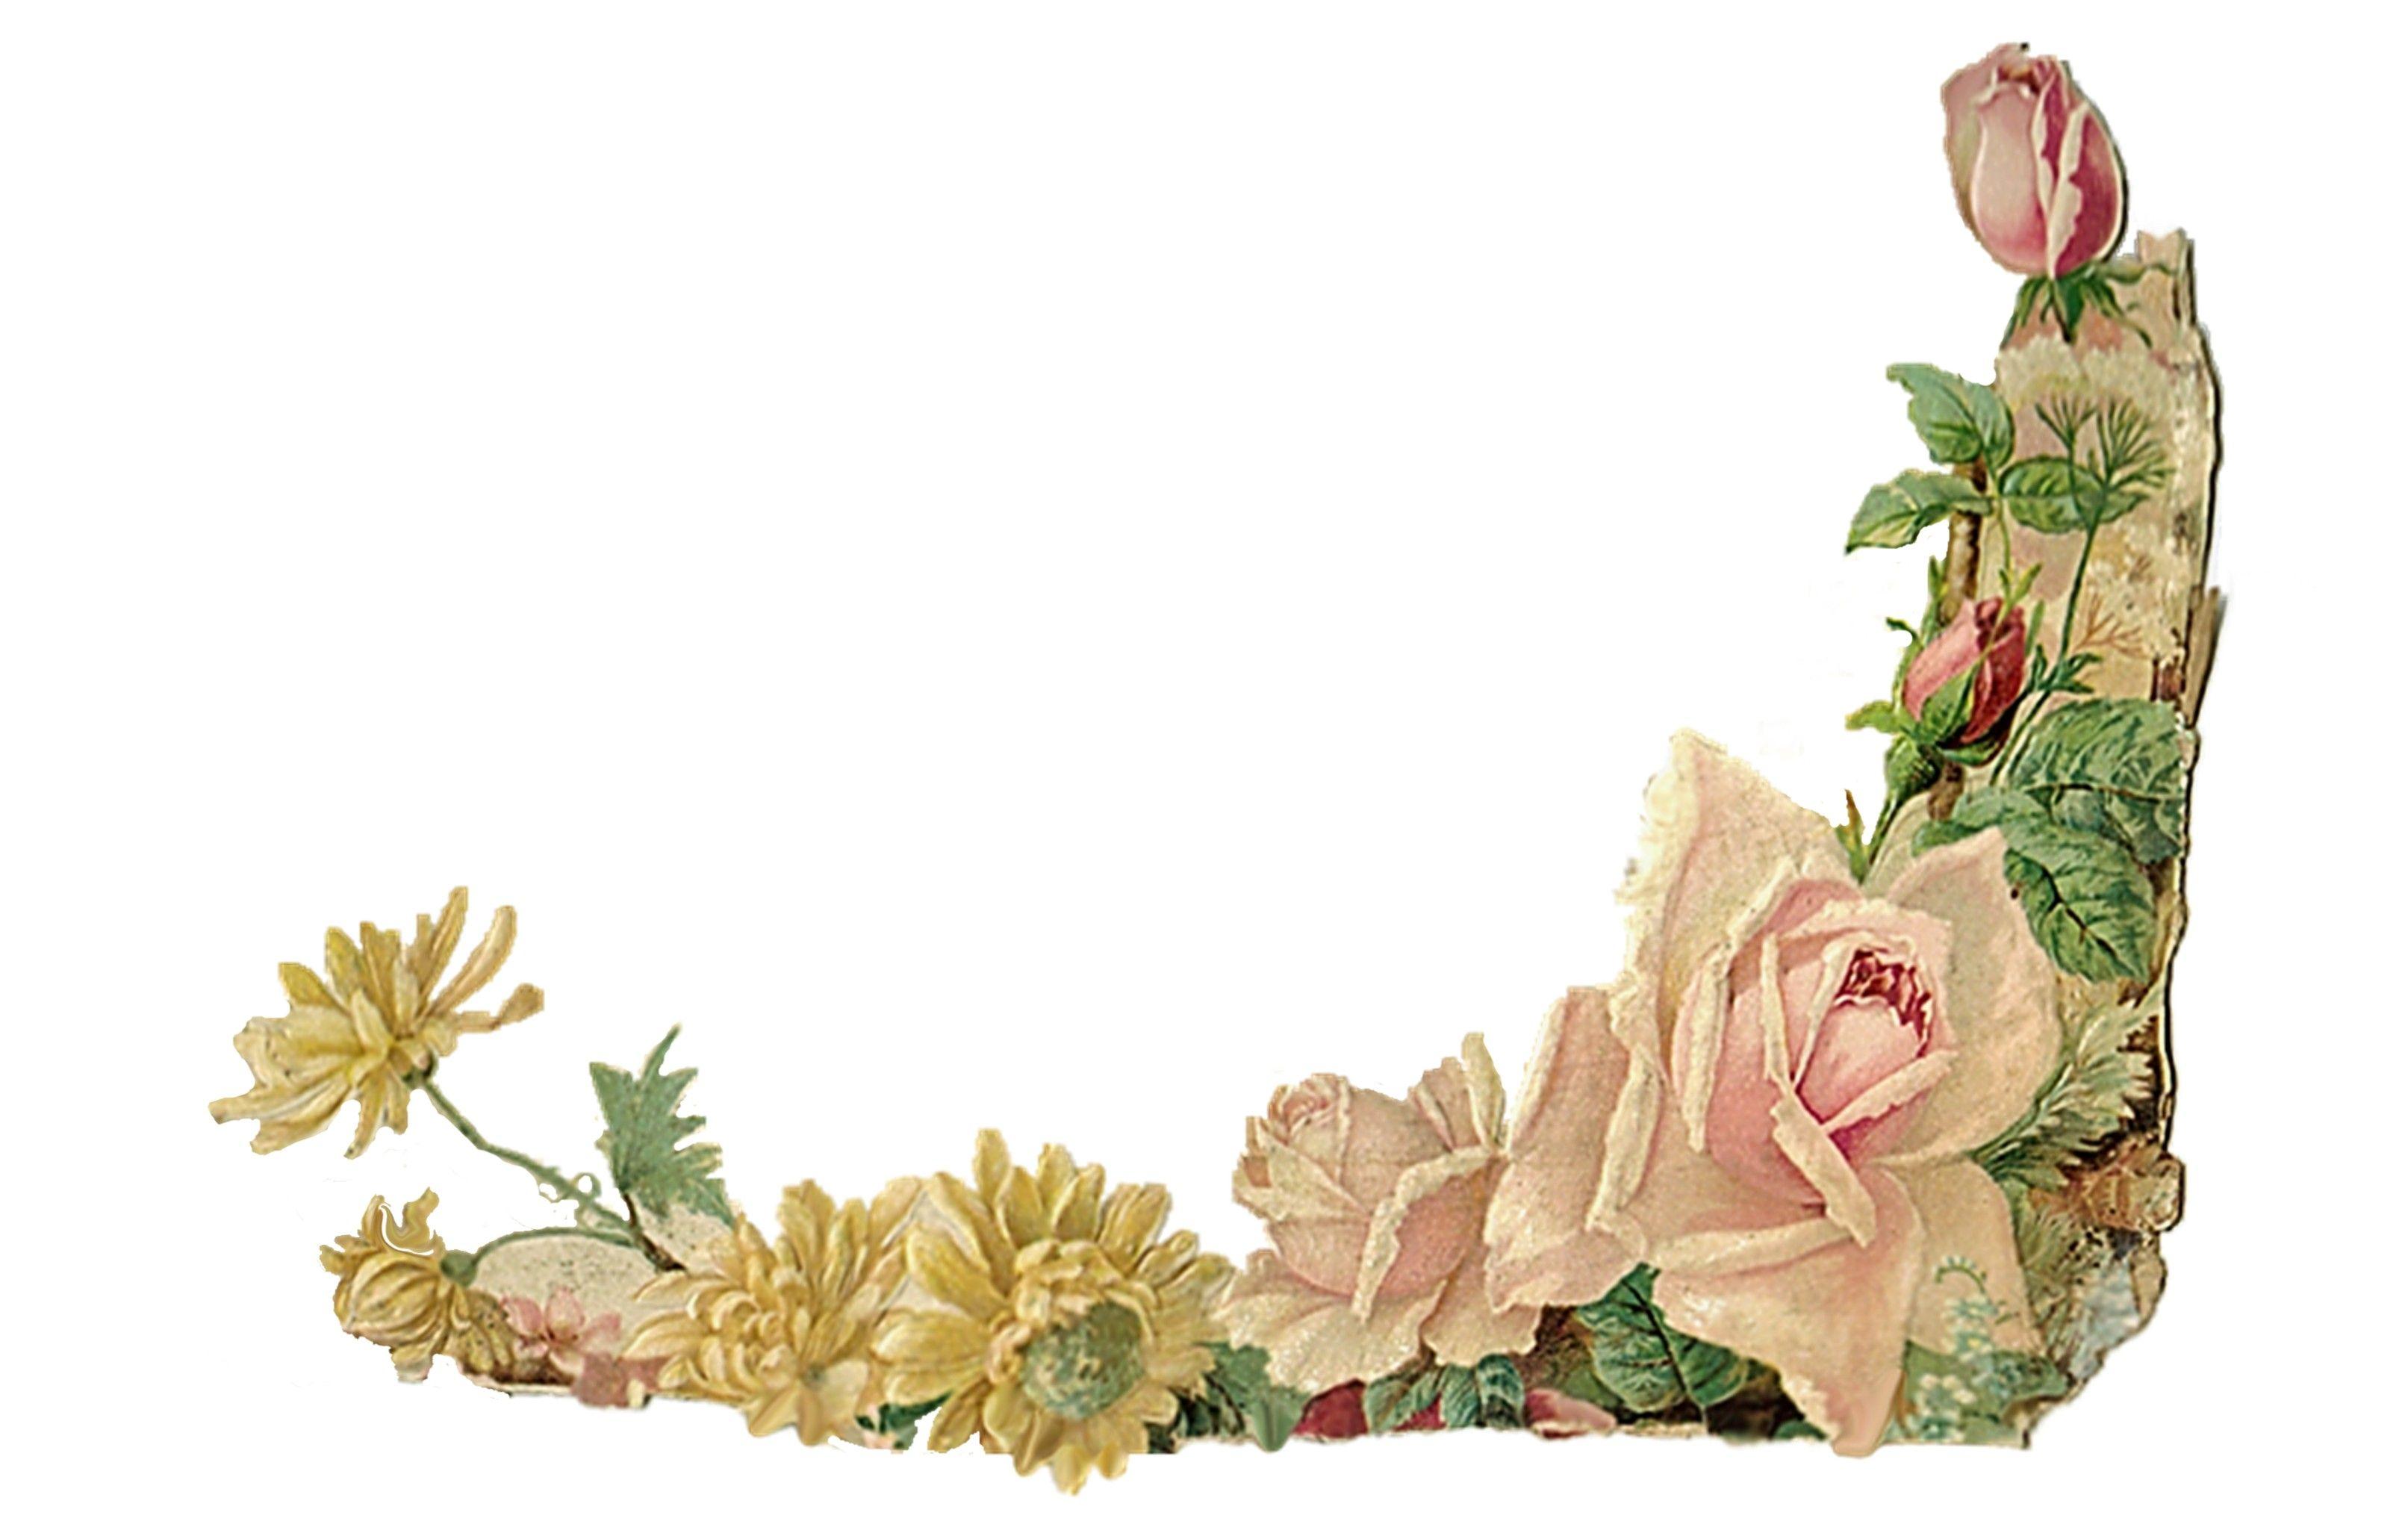 Vintage Flower Corner Border Clipart.